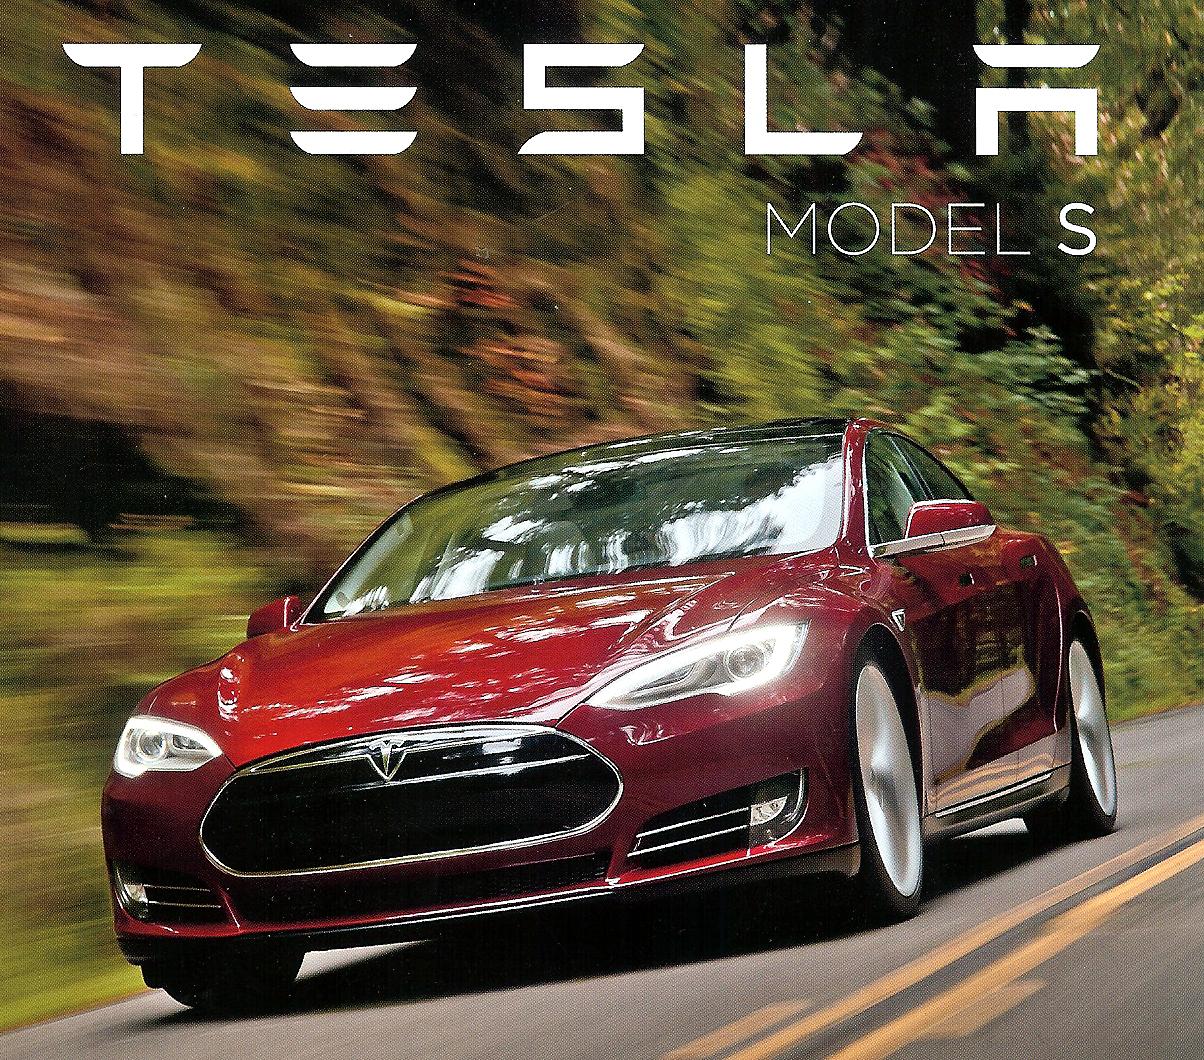 Supercharged Electric Az: WINGCOM WATCHDOG (WW): Tesla, Electric Vehicle Company, In